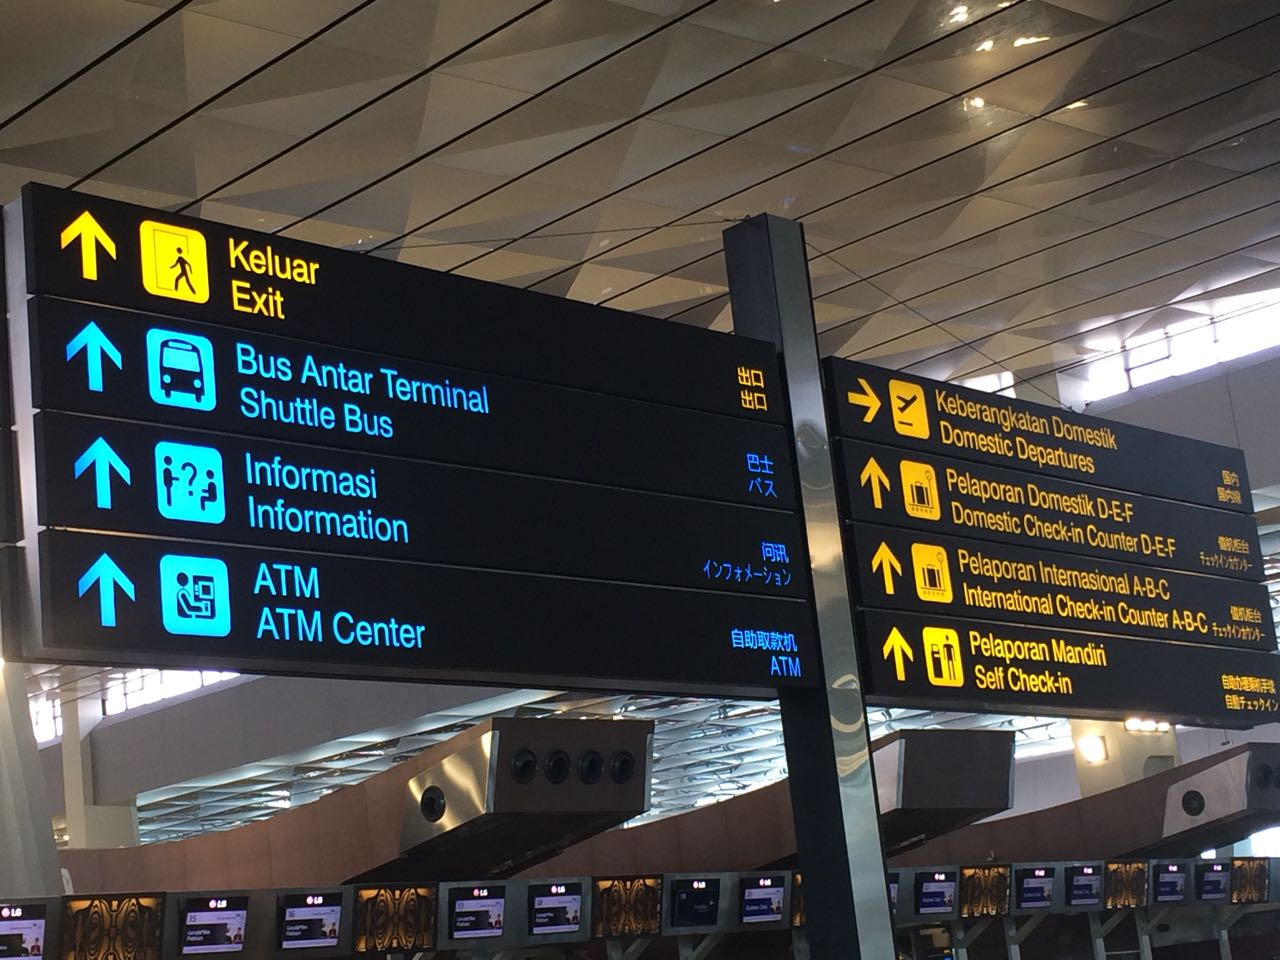 https: img-o.okeinfo.net content 2019 01 11 320 2003239 ap-ii-targetkan-kapasitas-penerbangan-200-000-penumpang-tahun-di-bandara-soedirman-YdtuHKMmVT.jpg